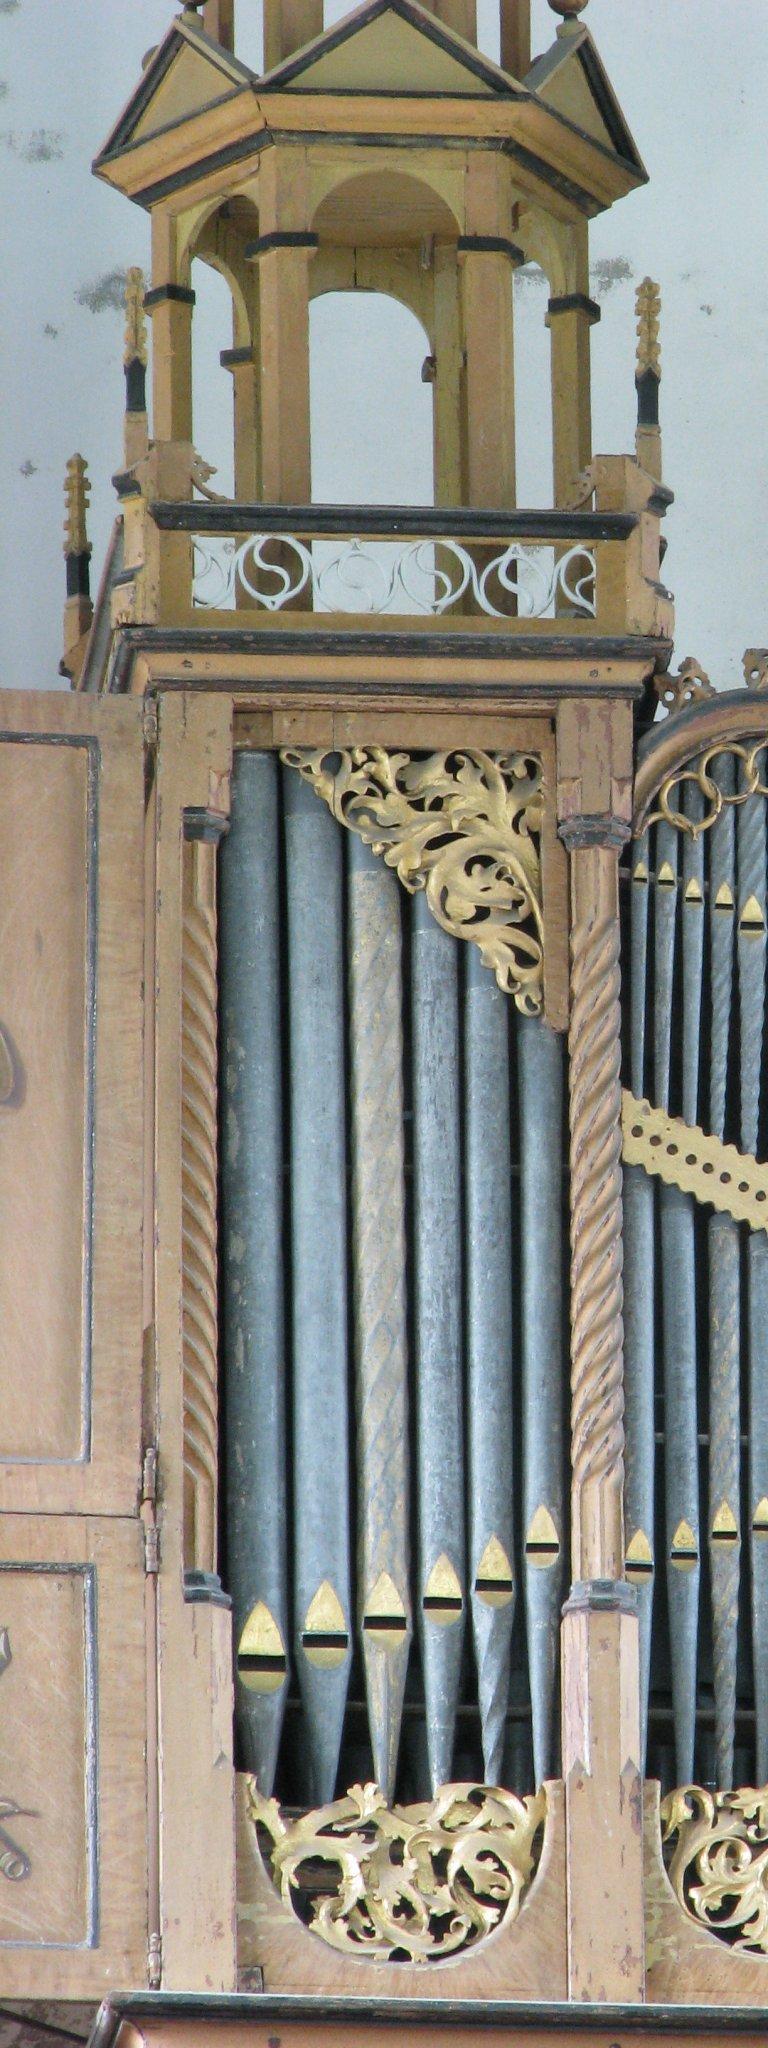 Orgel 1521